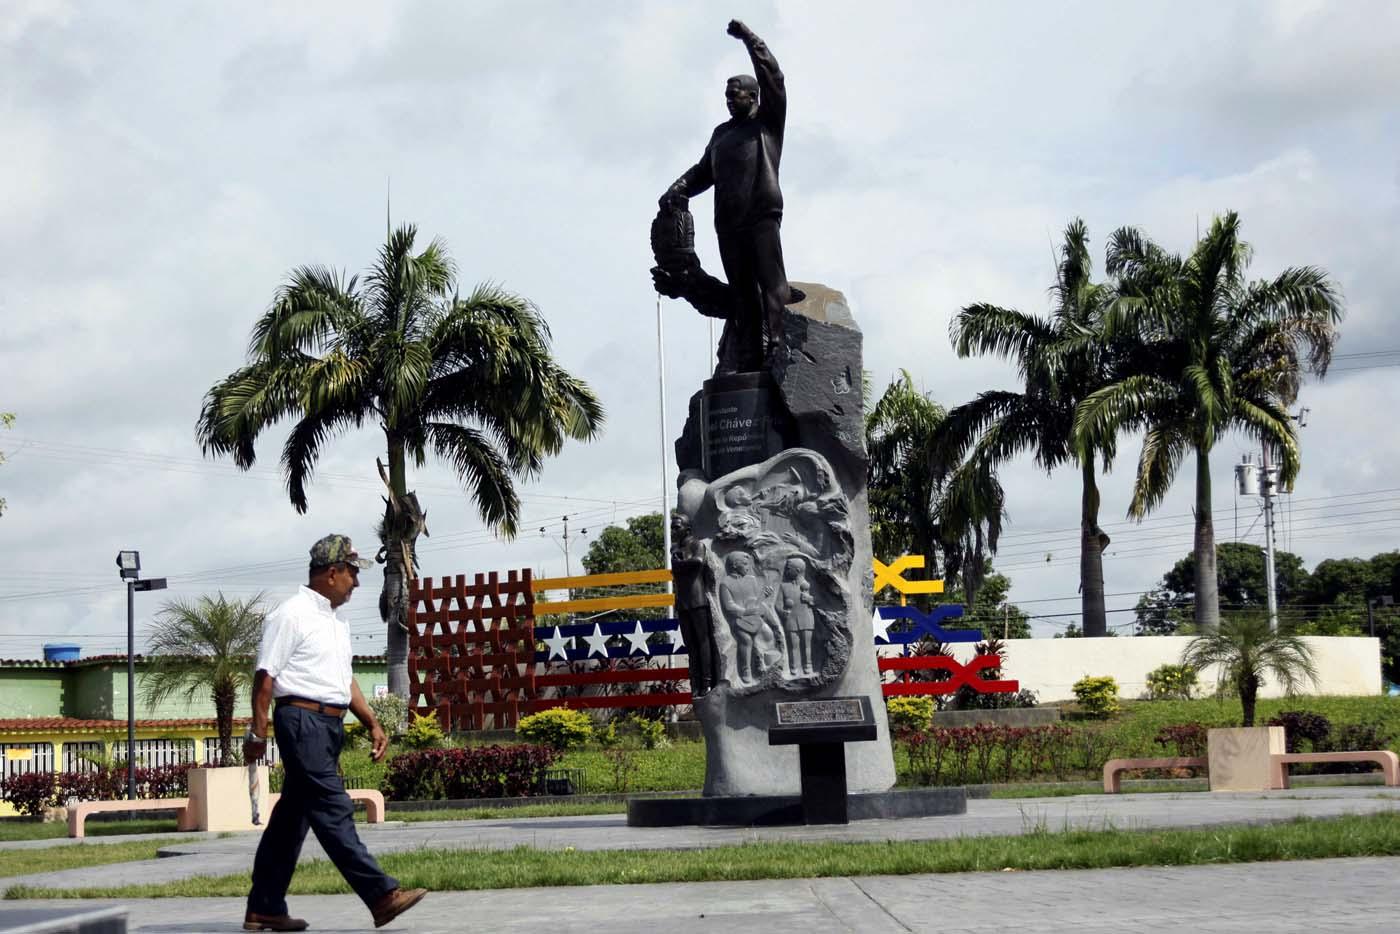 A man walks next to a statue of Venezuela's late President Hugo Chavez in Sabaneta, Venezuela June 13, 2017. Picture taken June 13, 2017. REUTERS/Carlos Eduardo Ramirez